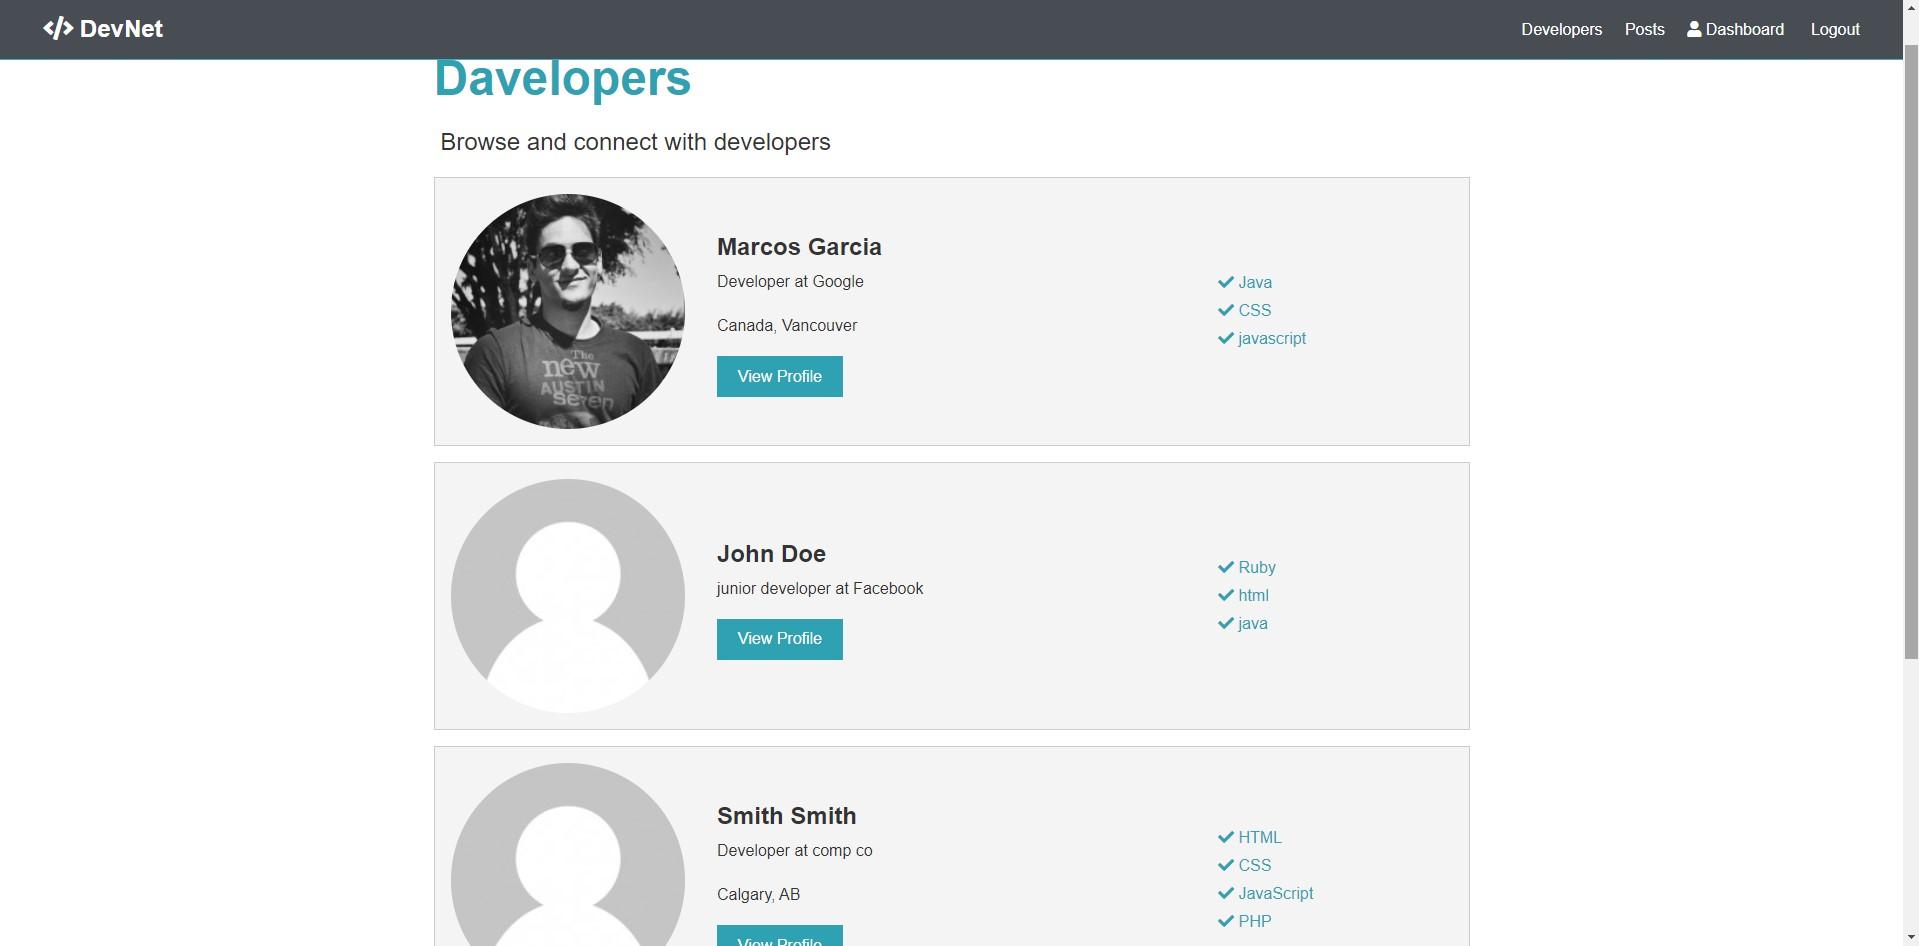 Web App developers Page